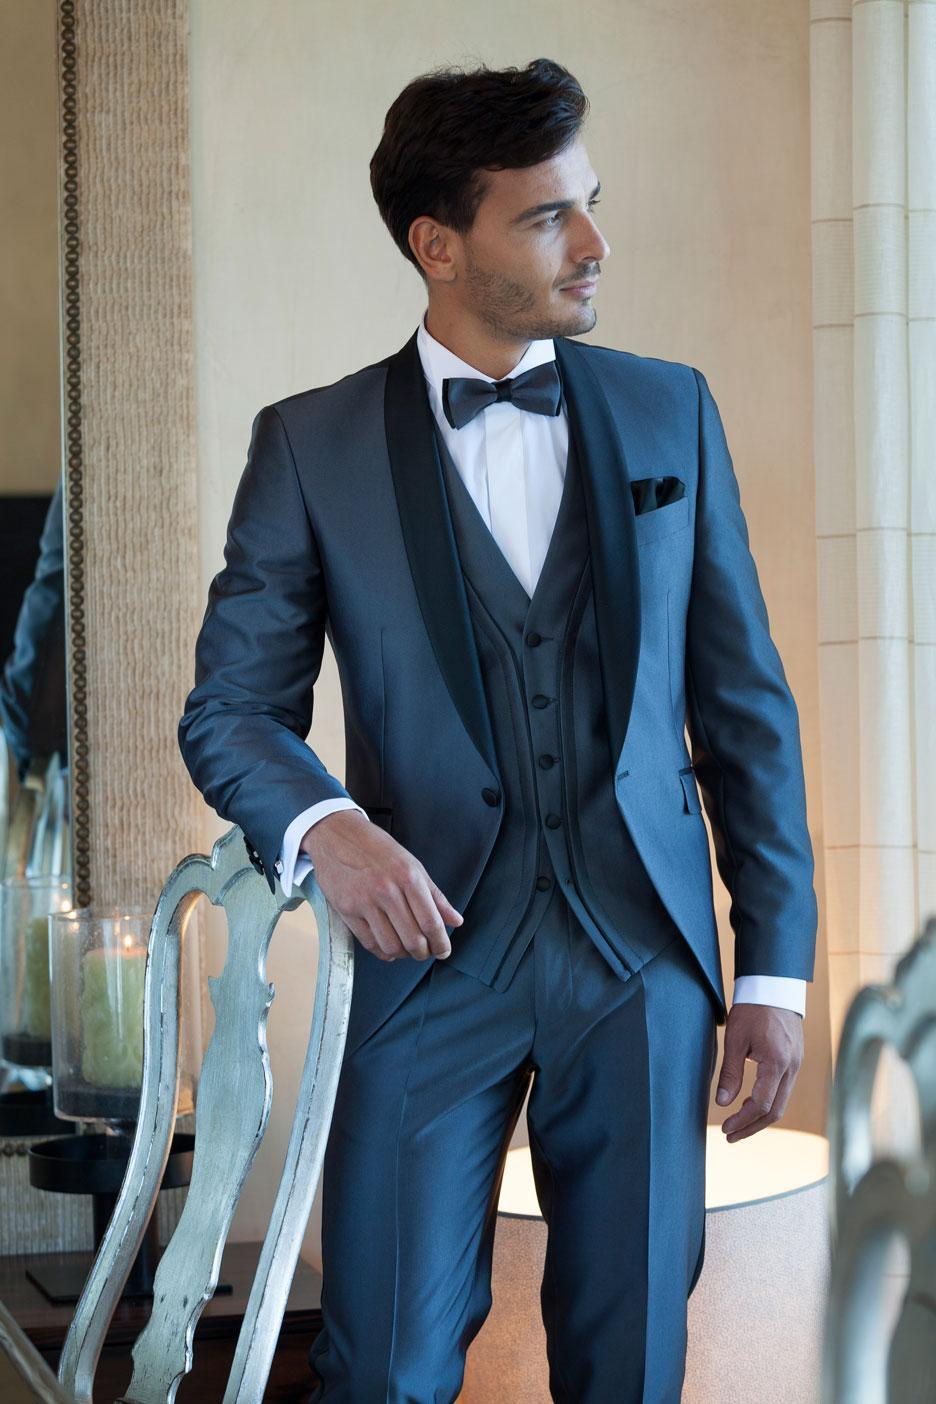 2016 Italian Charcoal Tuxedo Suits wedding suits Jacket+Pants+Tie+ ...